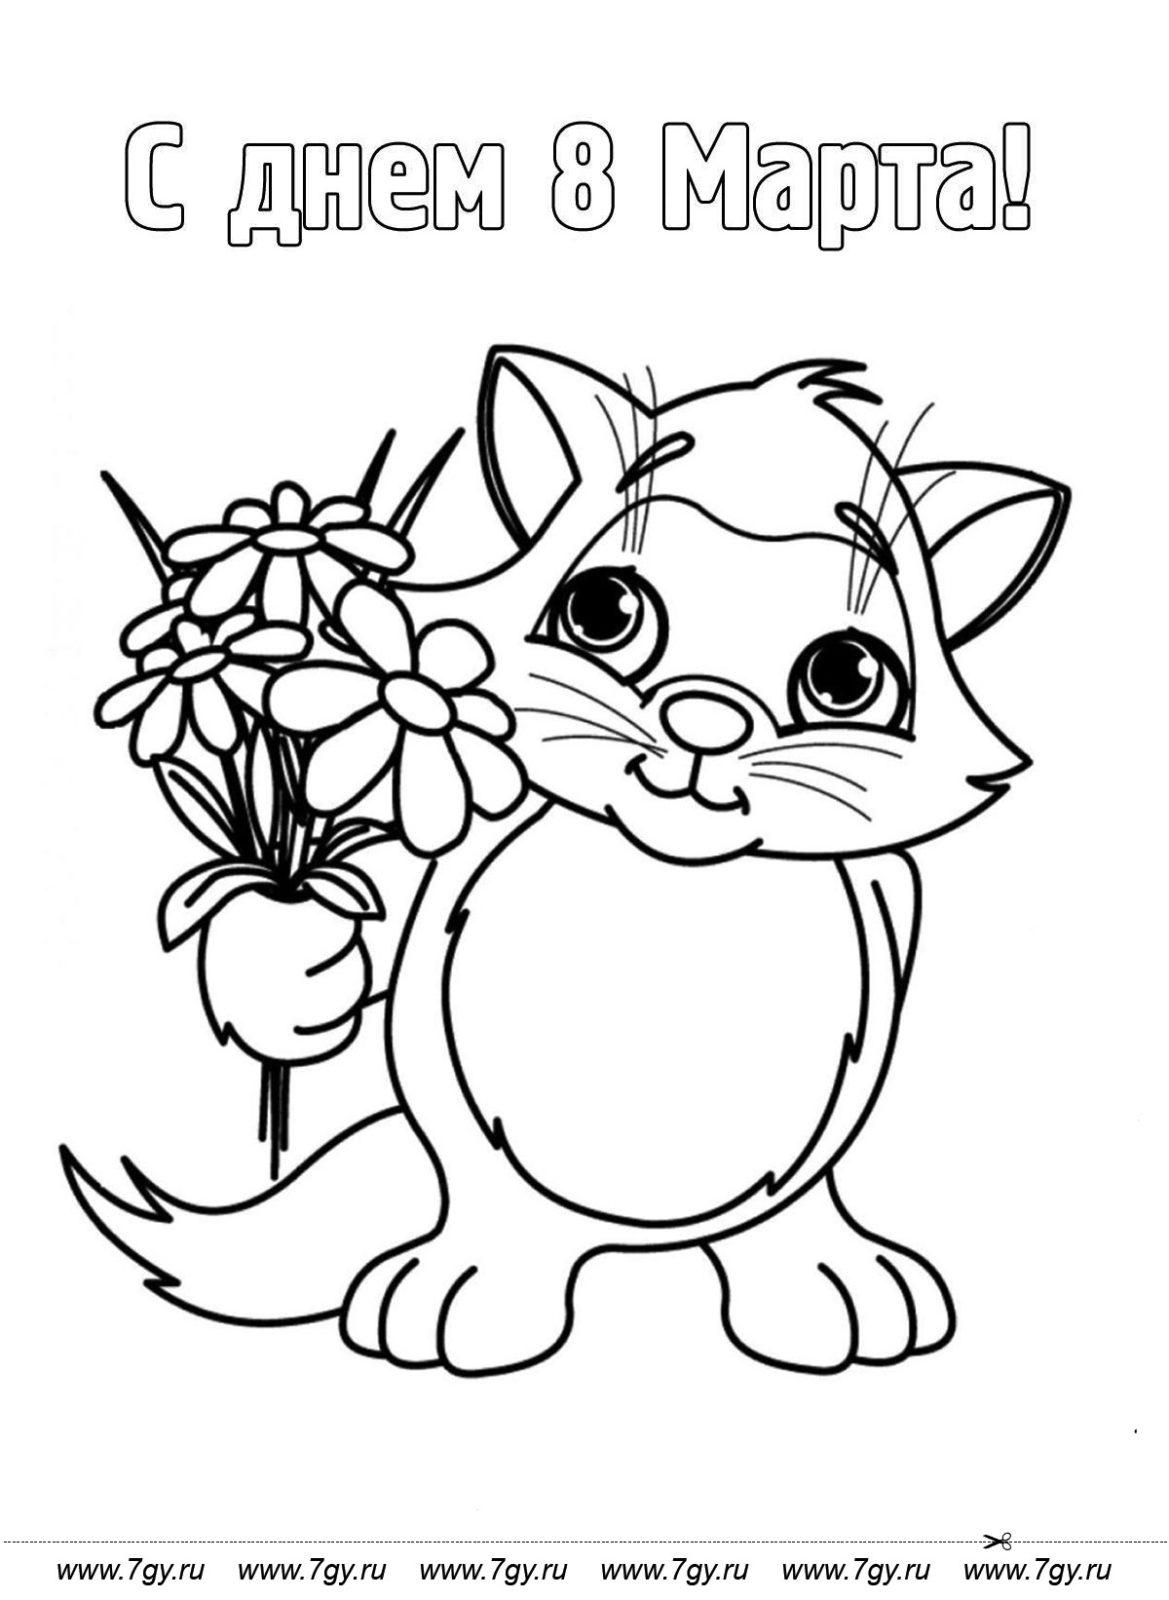 Котёнок раскраска 2